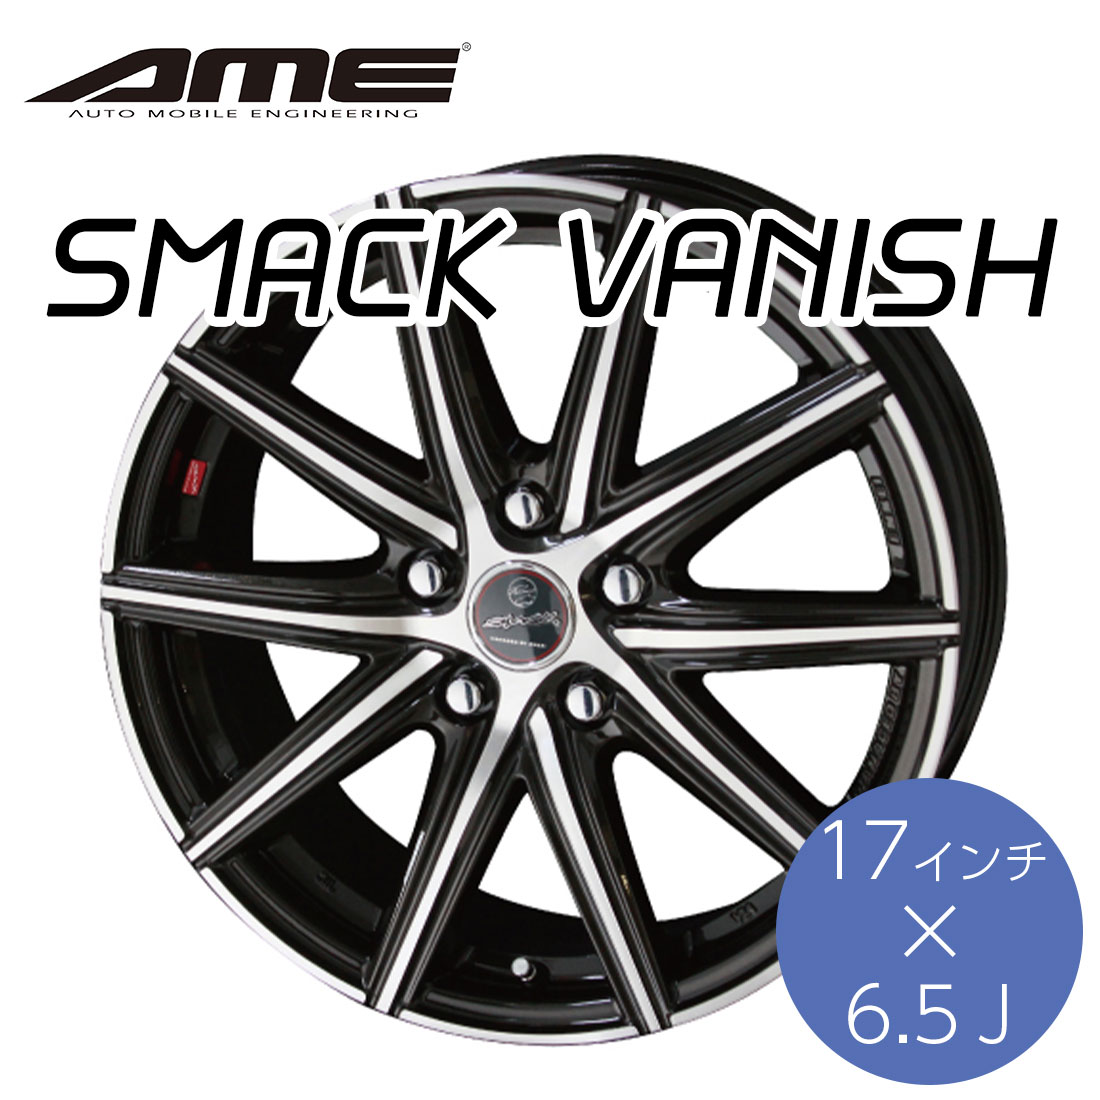 KYOHO ホイール スマック ヴァニッシュ 17×6.5J インチ 5H PCD 114.3 SMACK VANISH by AME 共豊 ブラウンドブラックメタリック×ポリッシュ かっこいい 車